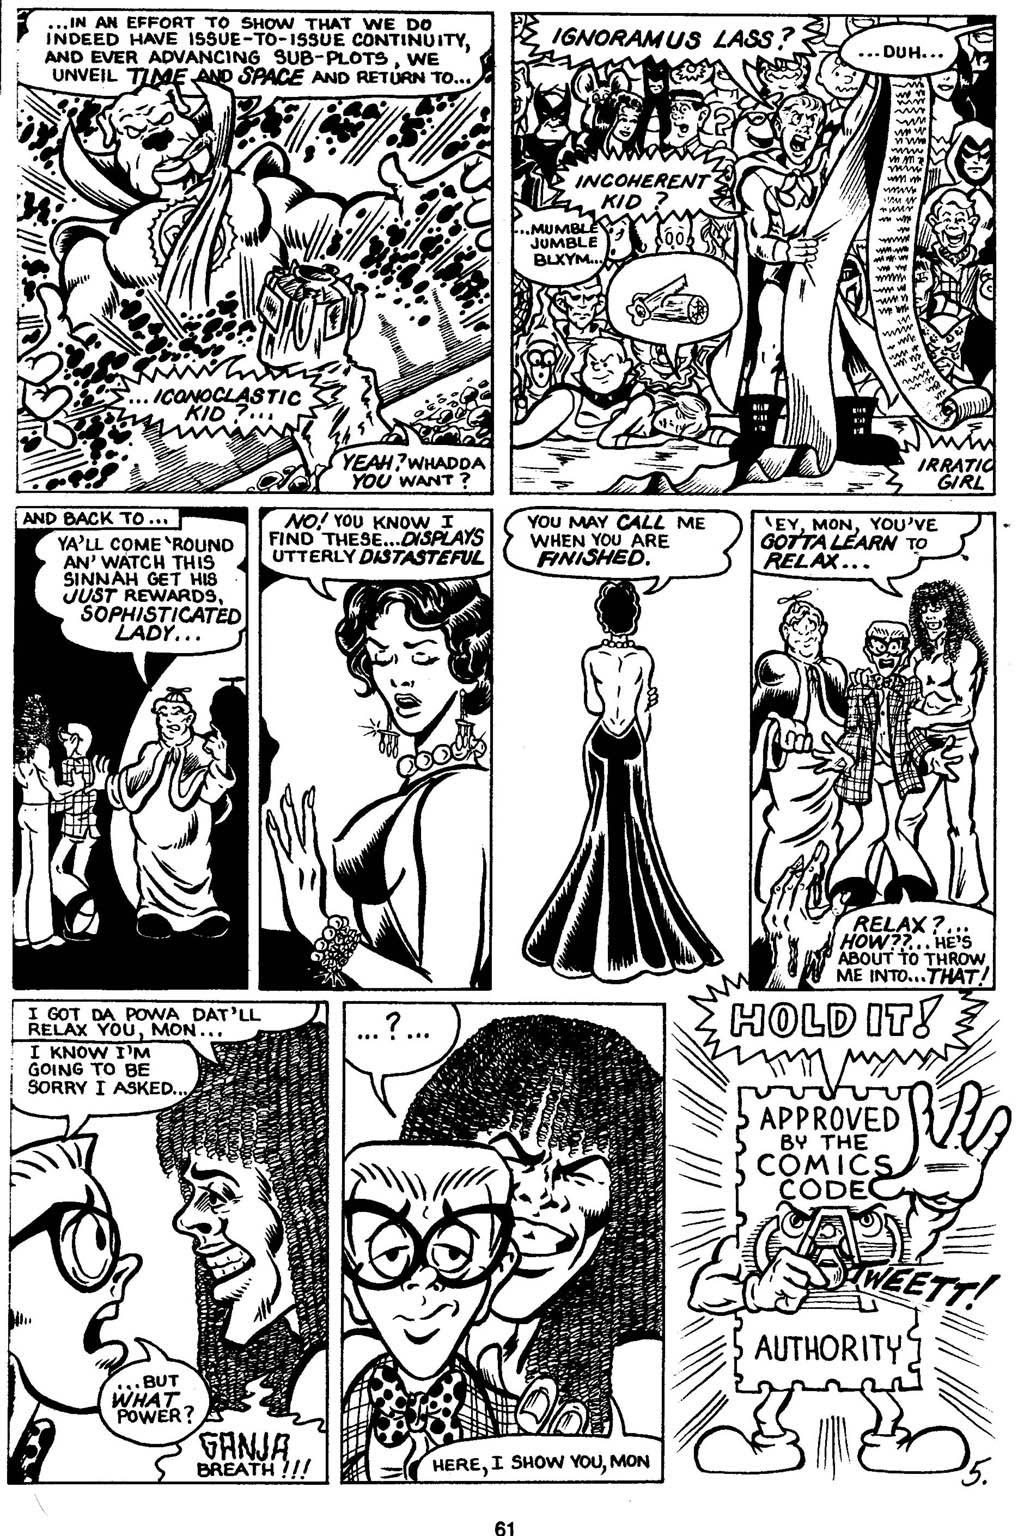 Read online Normalman - The Novel comic -  Issue # TPB (Part 1) - 65